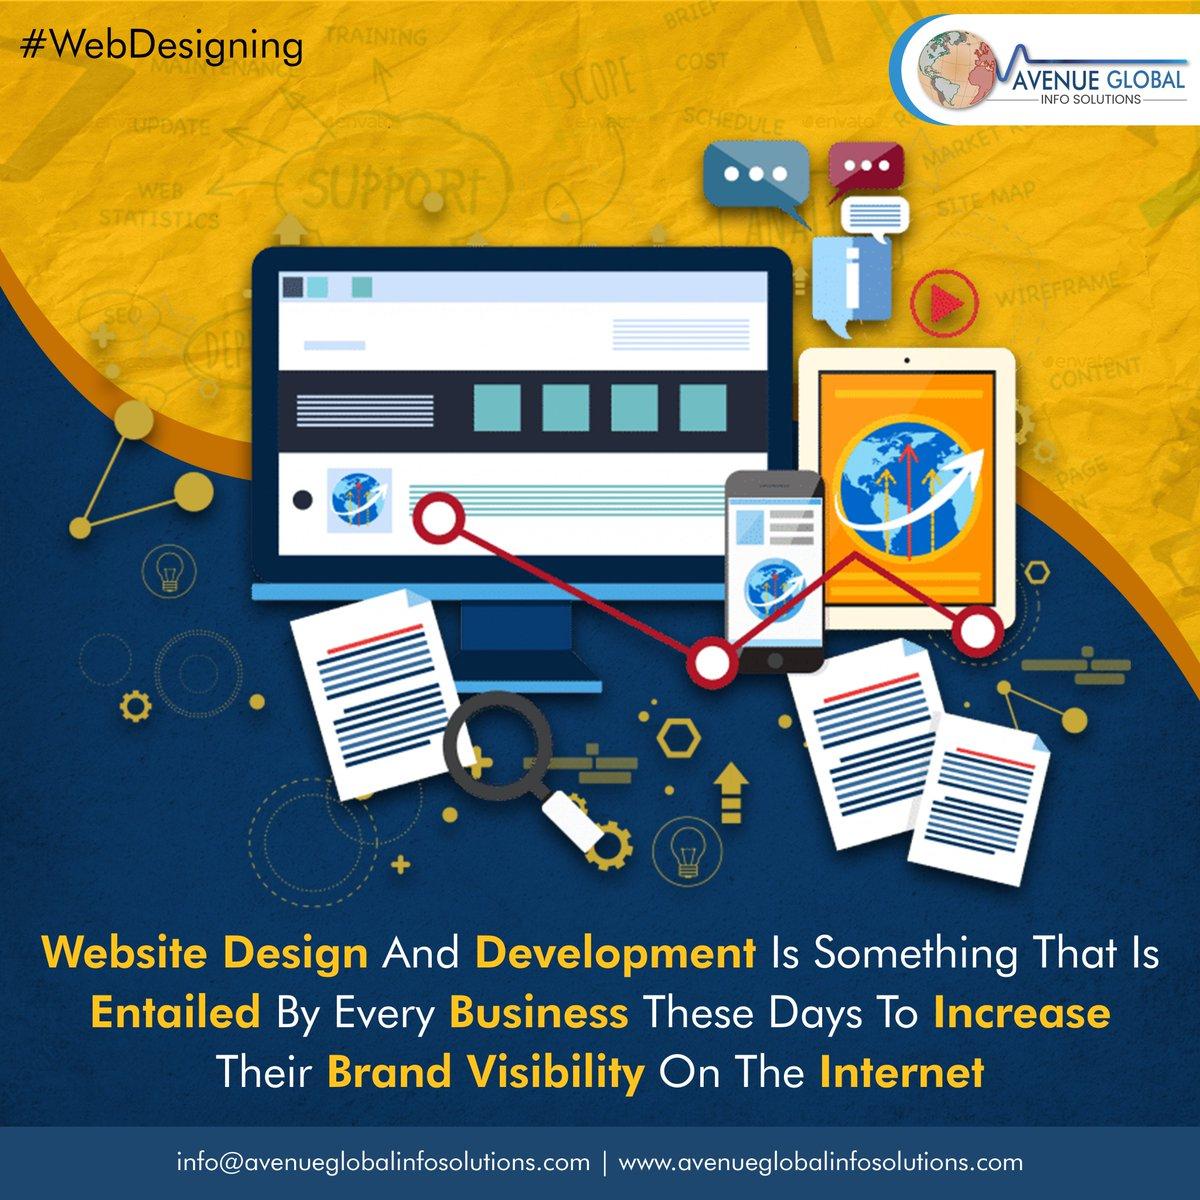 To Increase Brand Visibility on the Internet Every business needs a Website.  #webdesign #whywebdevelopment #webdesigncompany #websitedeveloper #webdesigntips #instatech #instatechno #Avenueglobalinfosolutions #avenueglobal #Webdesigning #Digitalmarketing #Websitedevelopmentpic.twitter.com/IhHAeRuFOz